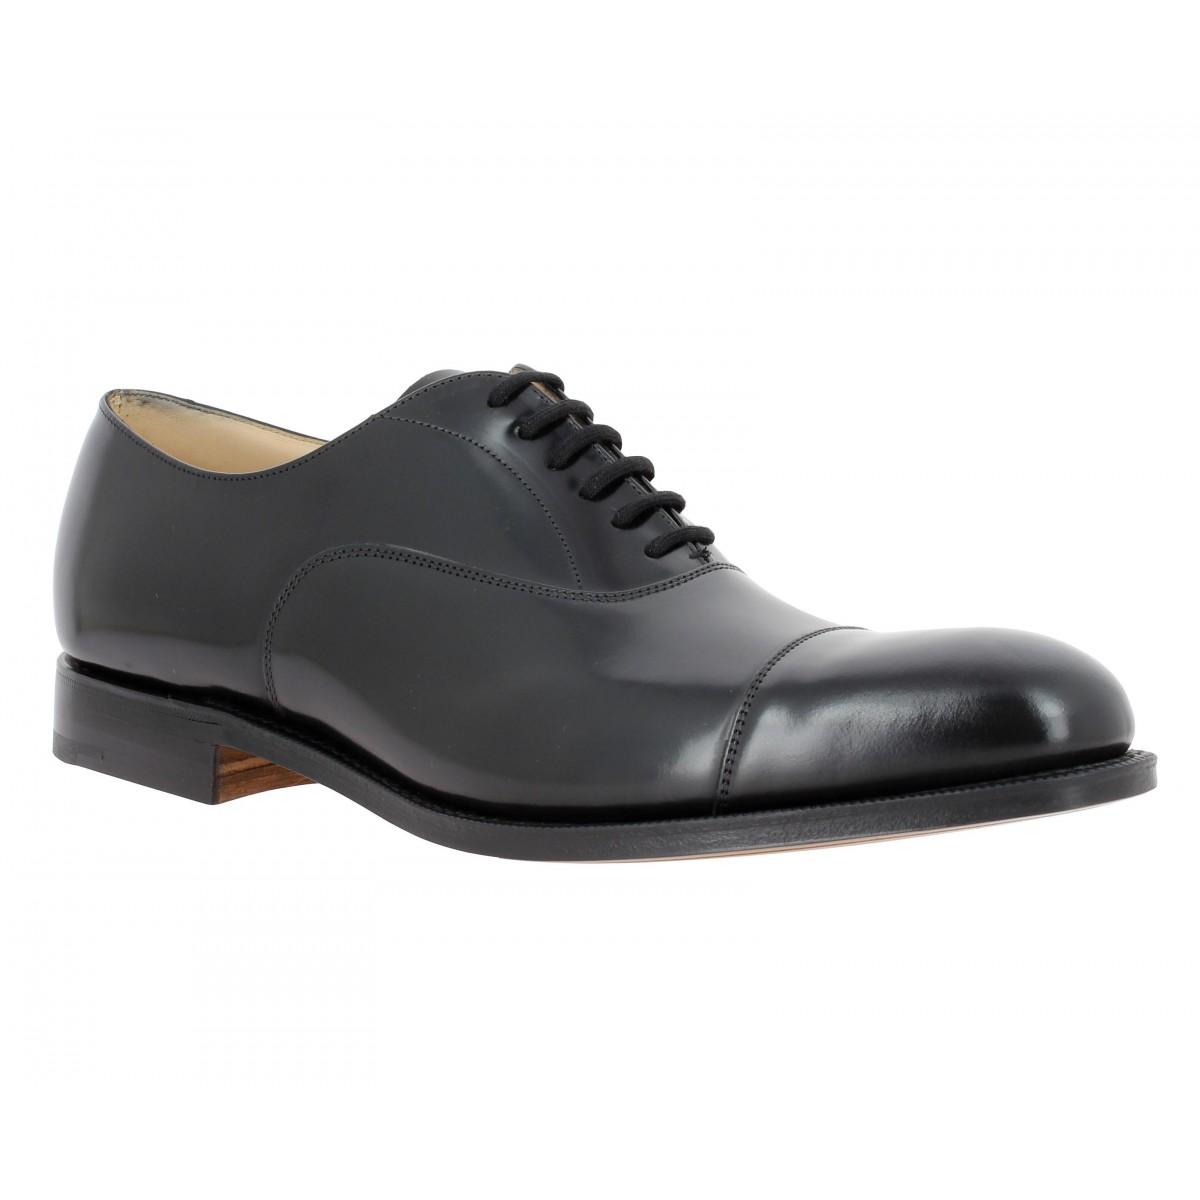 Chaussures à lacets CHURCH'S Hong Kong cuir Homme Noir